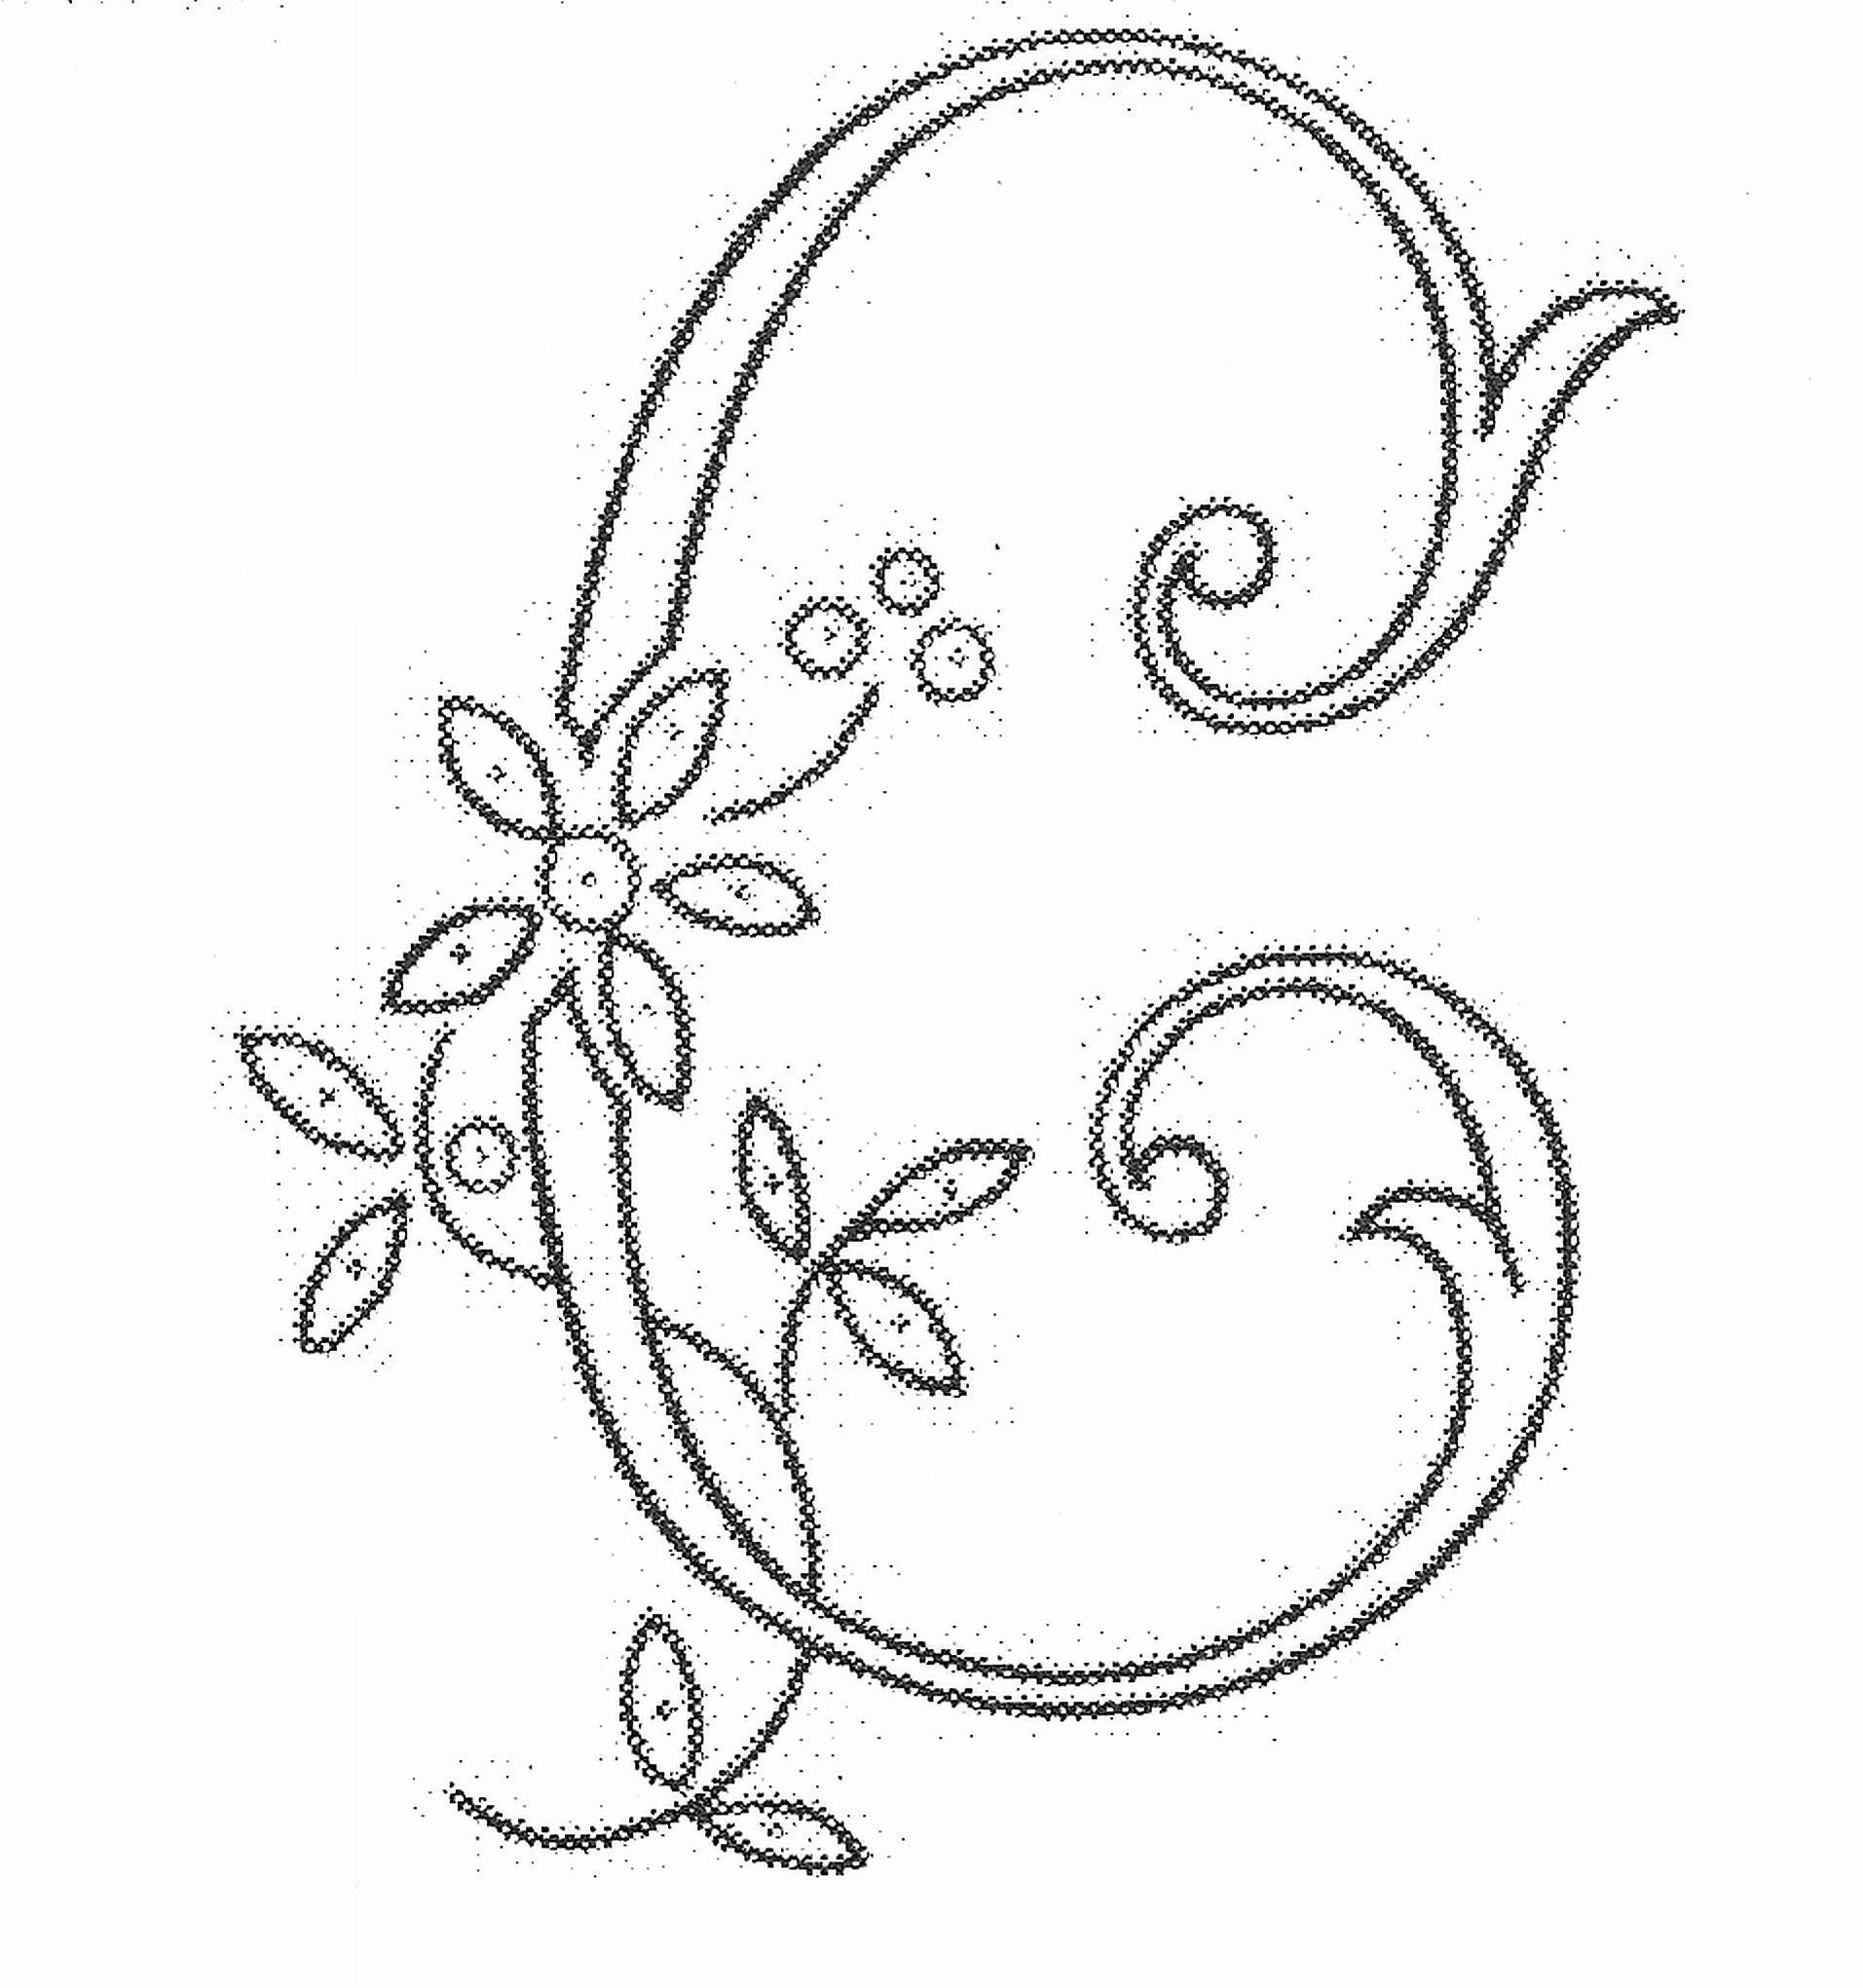 Decorative Letter C 03 04 2010 Monogram Embroideredletter C  Monograms Alphabet